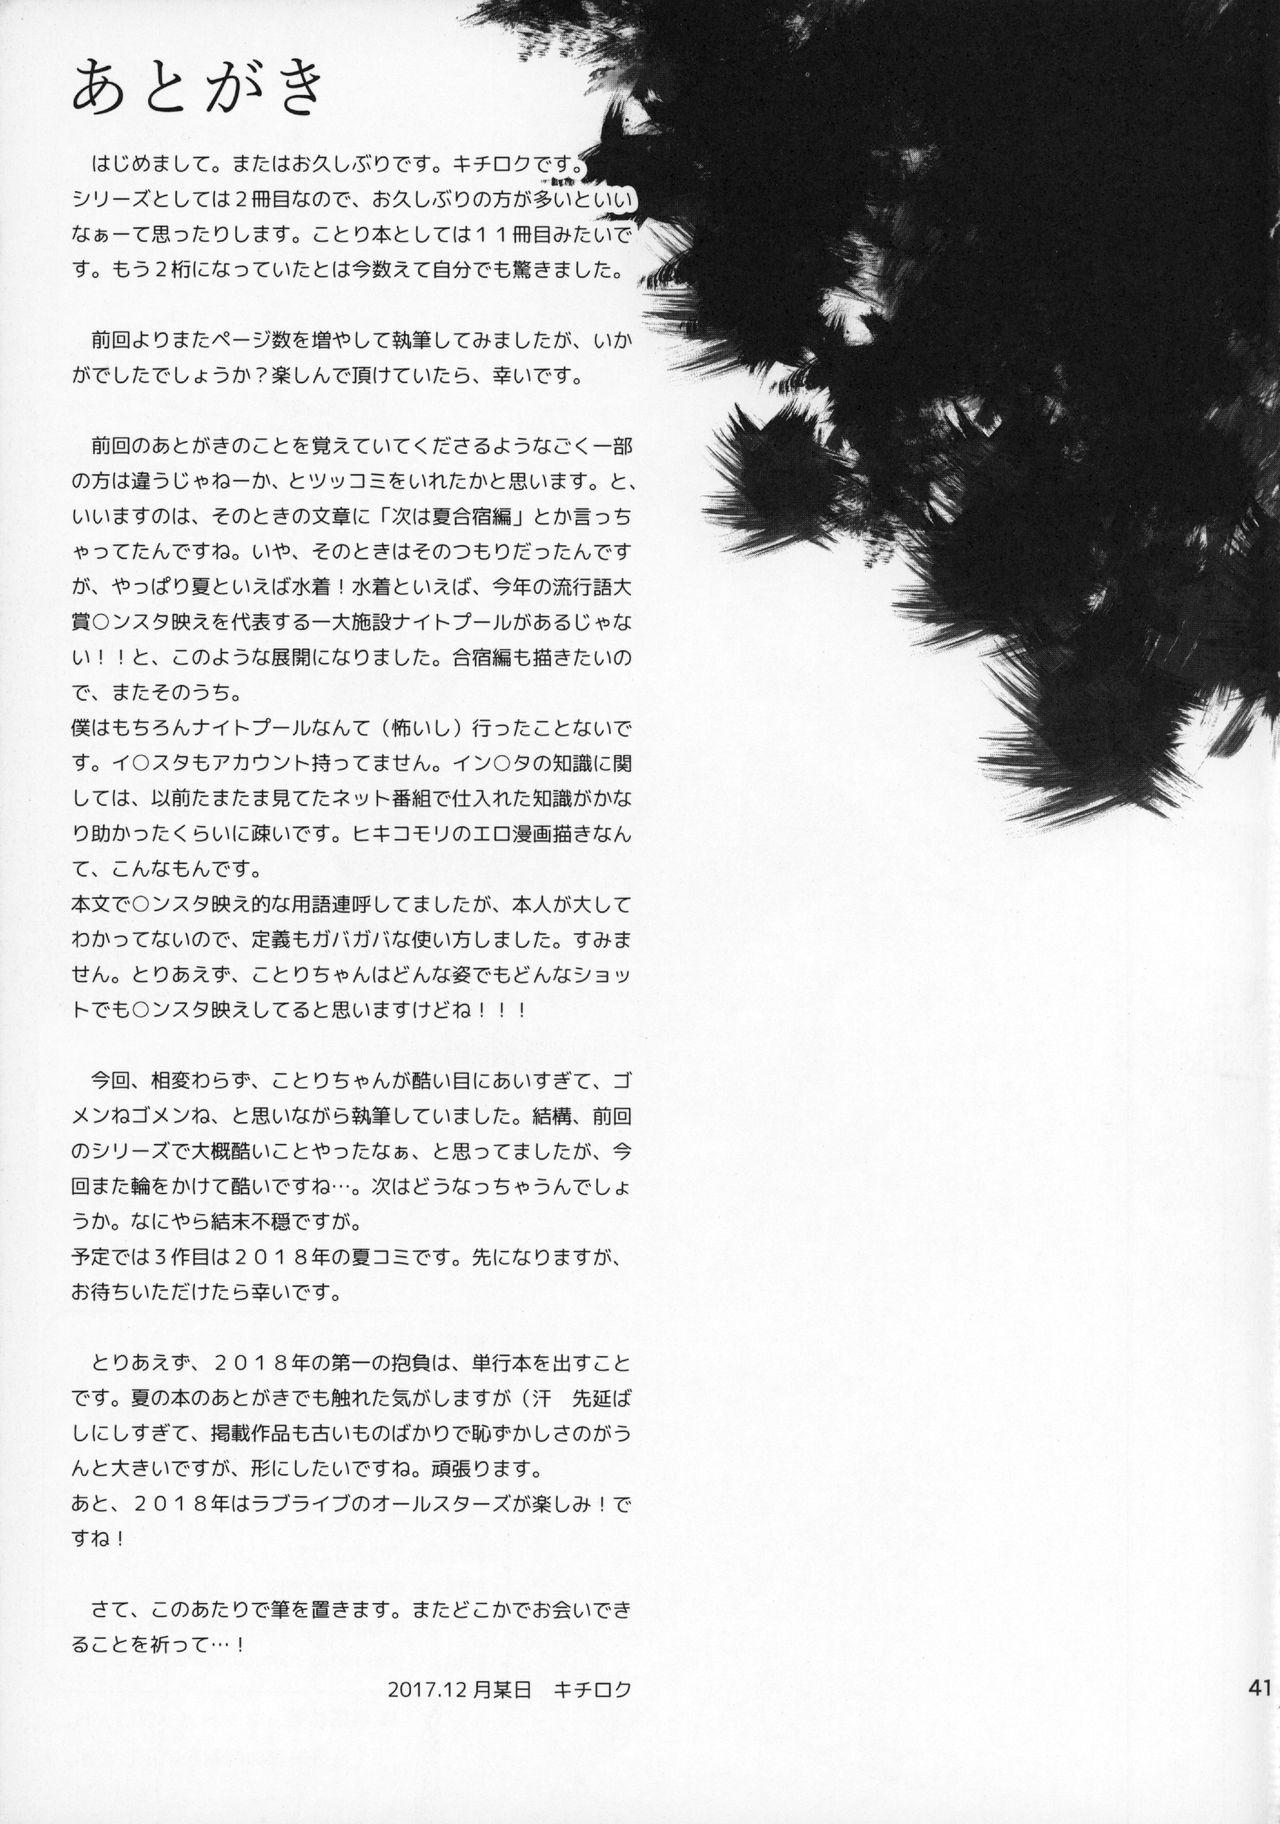 Joshidaisei Minami Kotori no YariCir Jikenbo Case. 2 | College Girl Kotori Minami's Hookup Circle Files Case #2 39